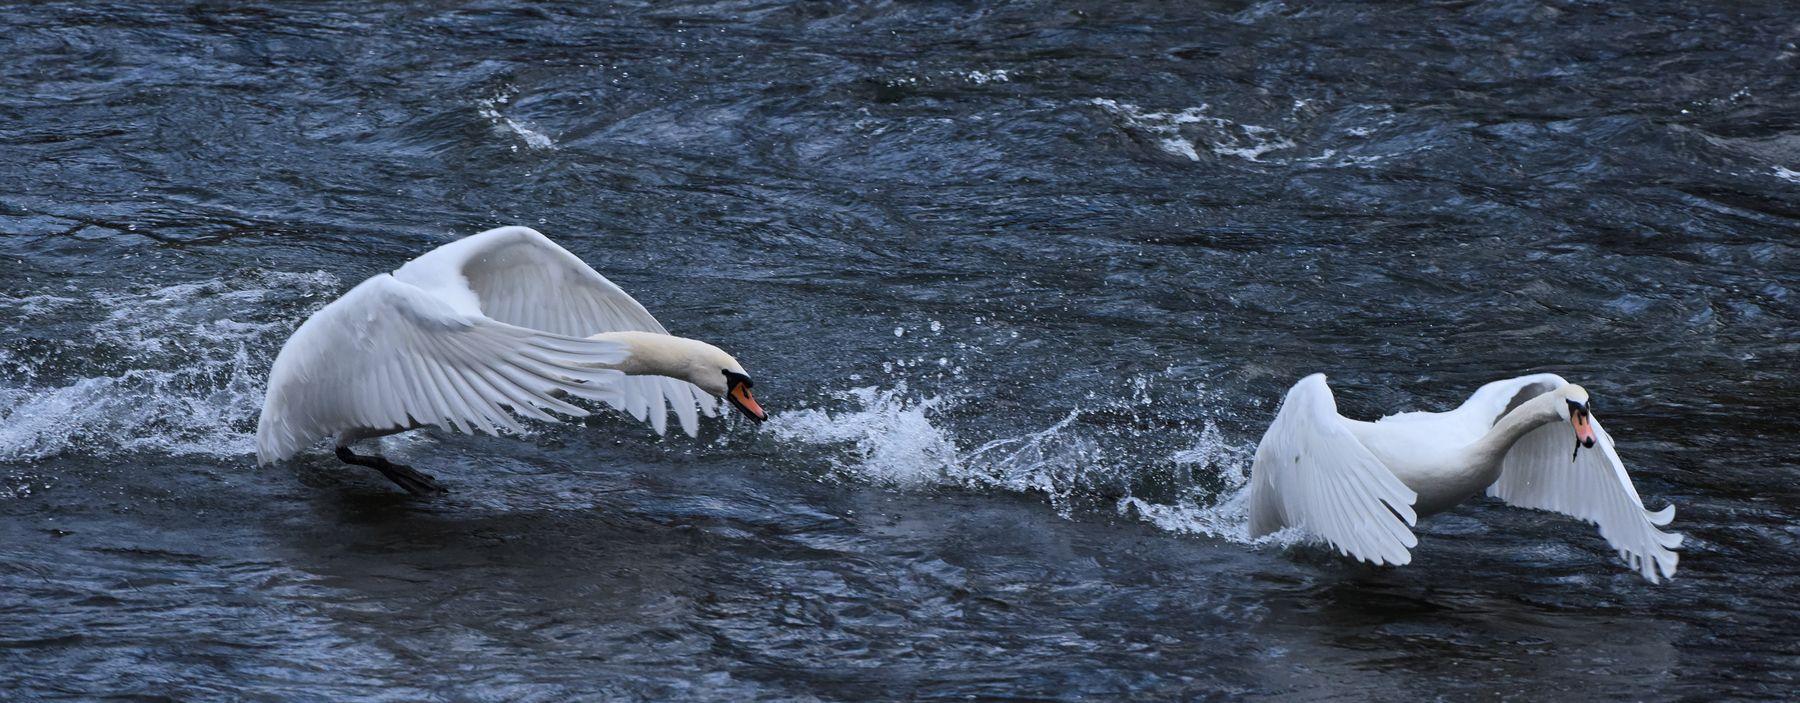 Весенние разборки утро река лебеди разборки